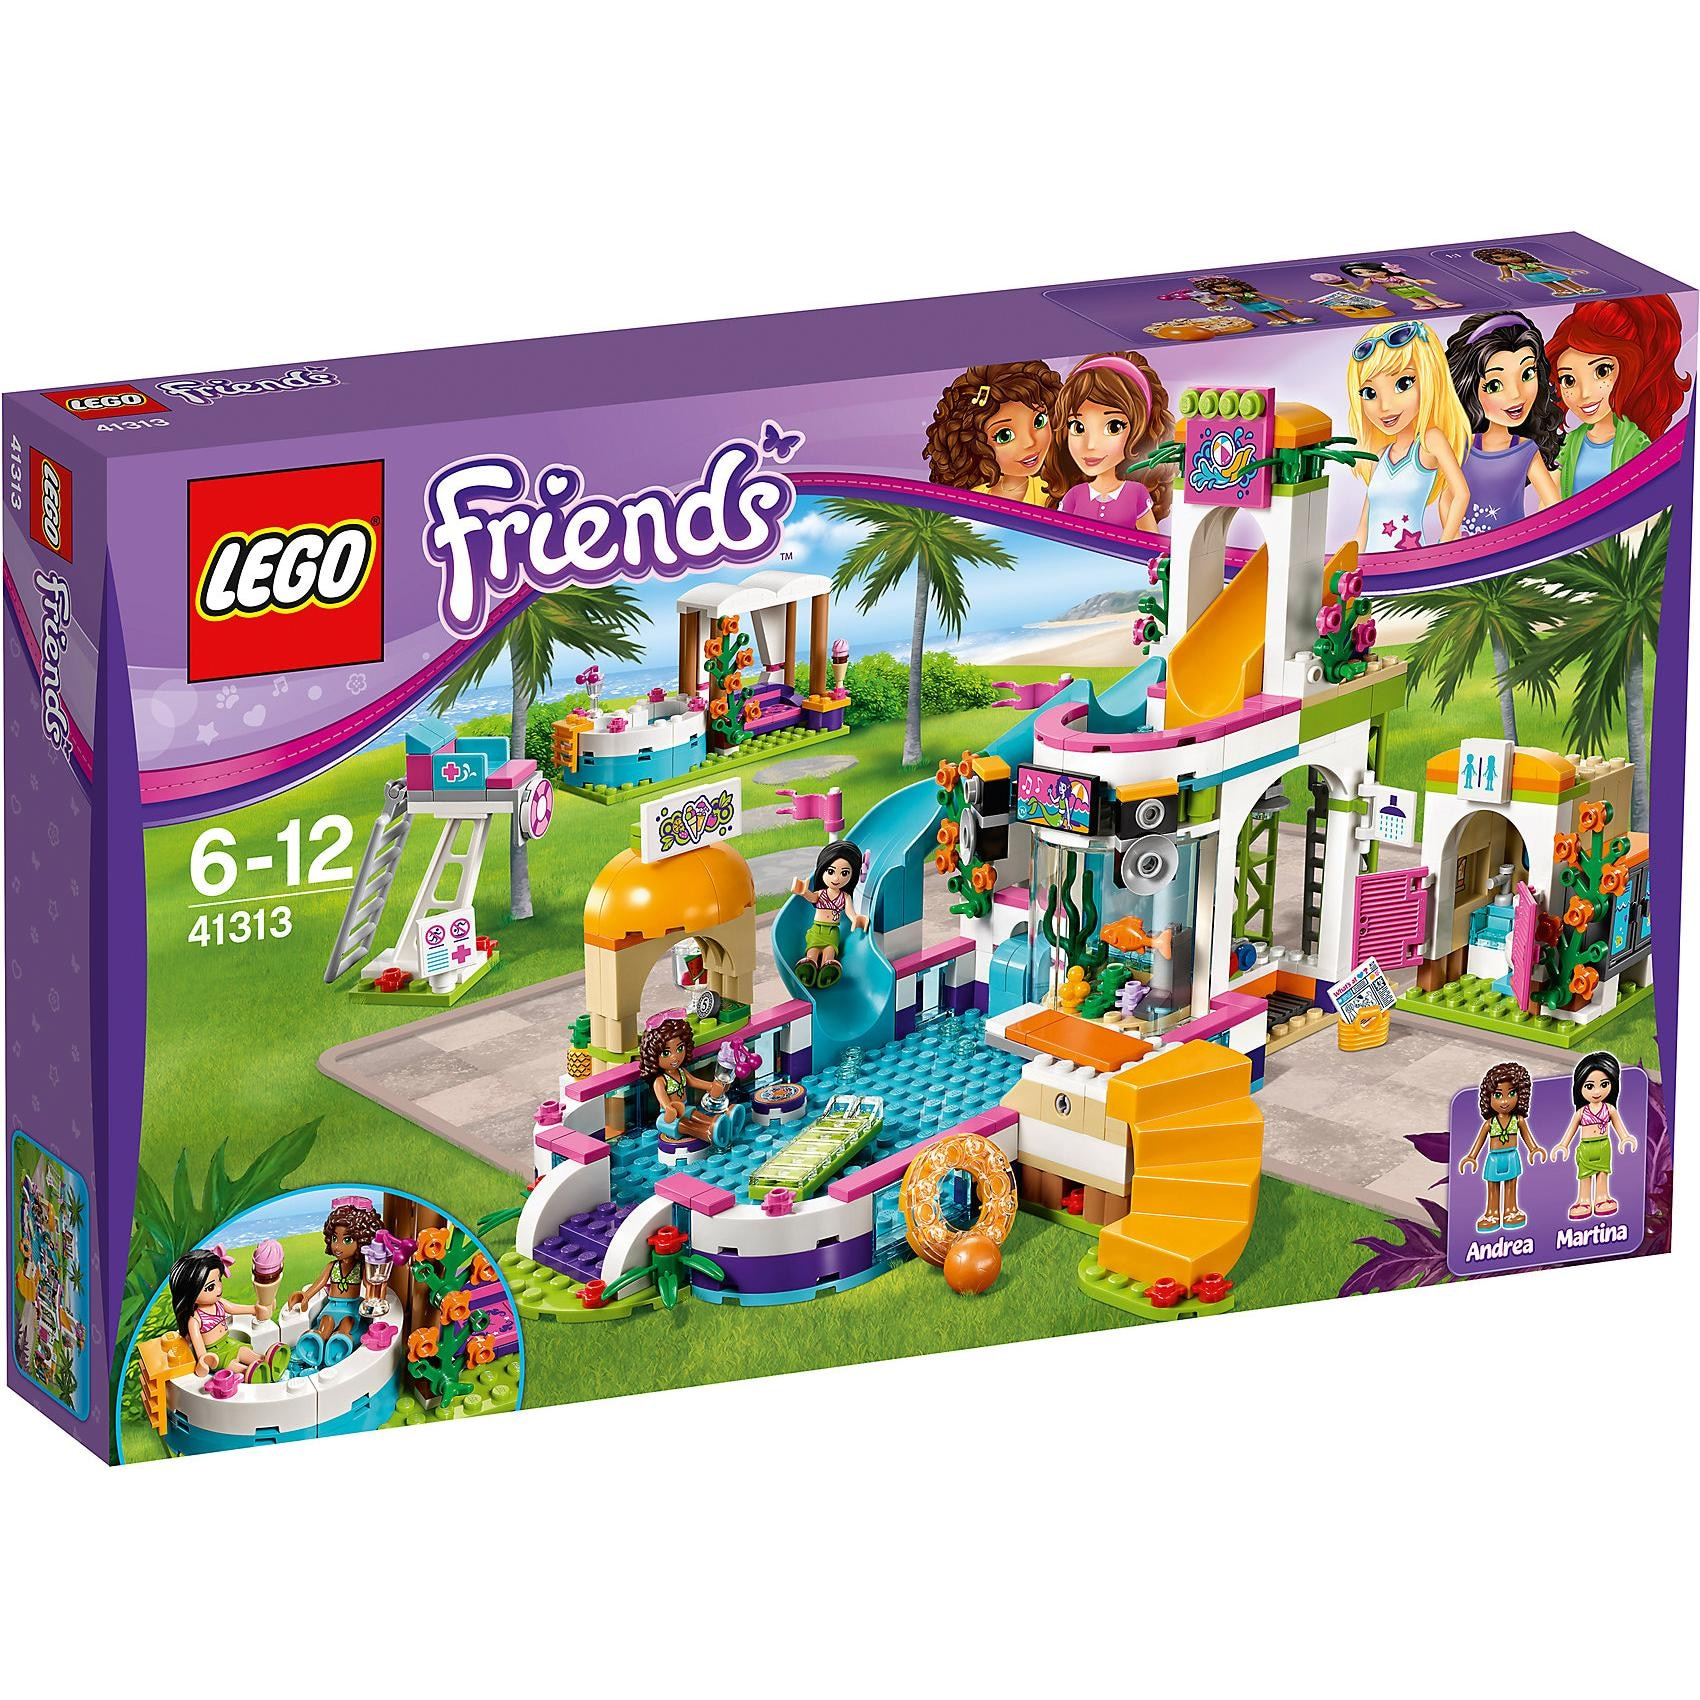 Lego Friends 41313 Heartlake Freibad